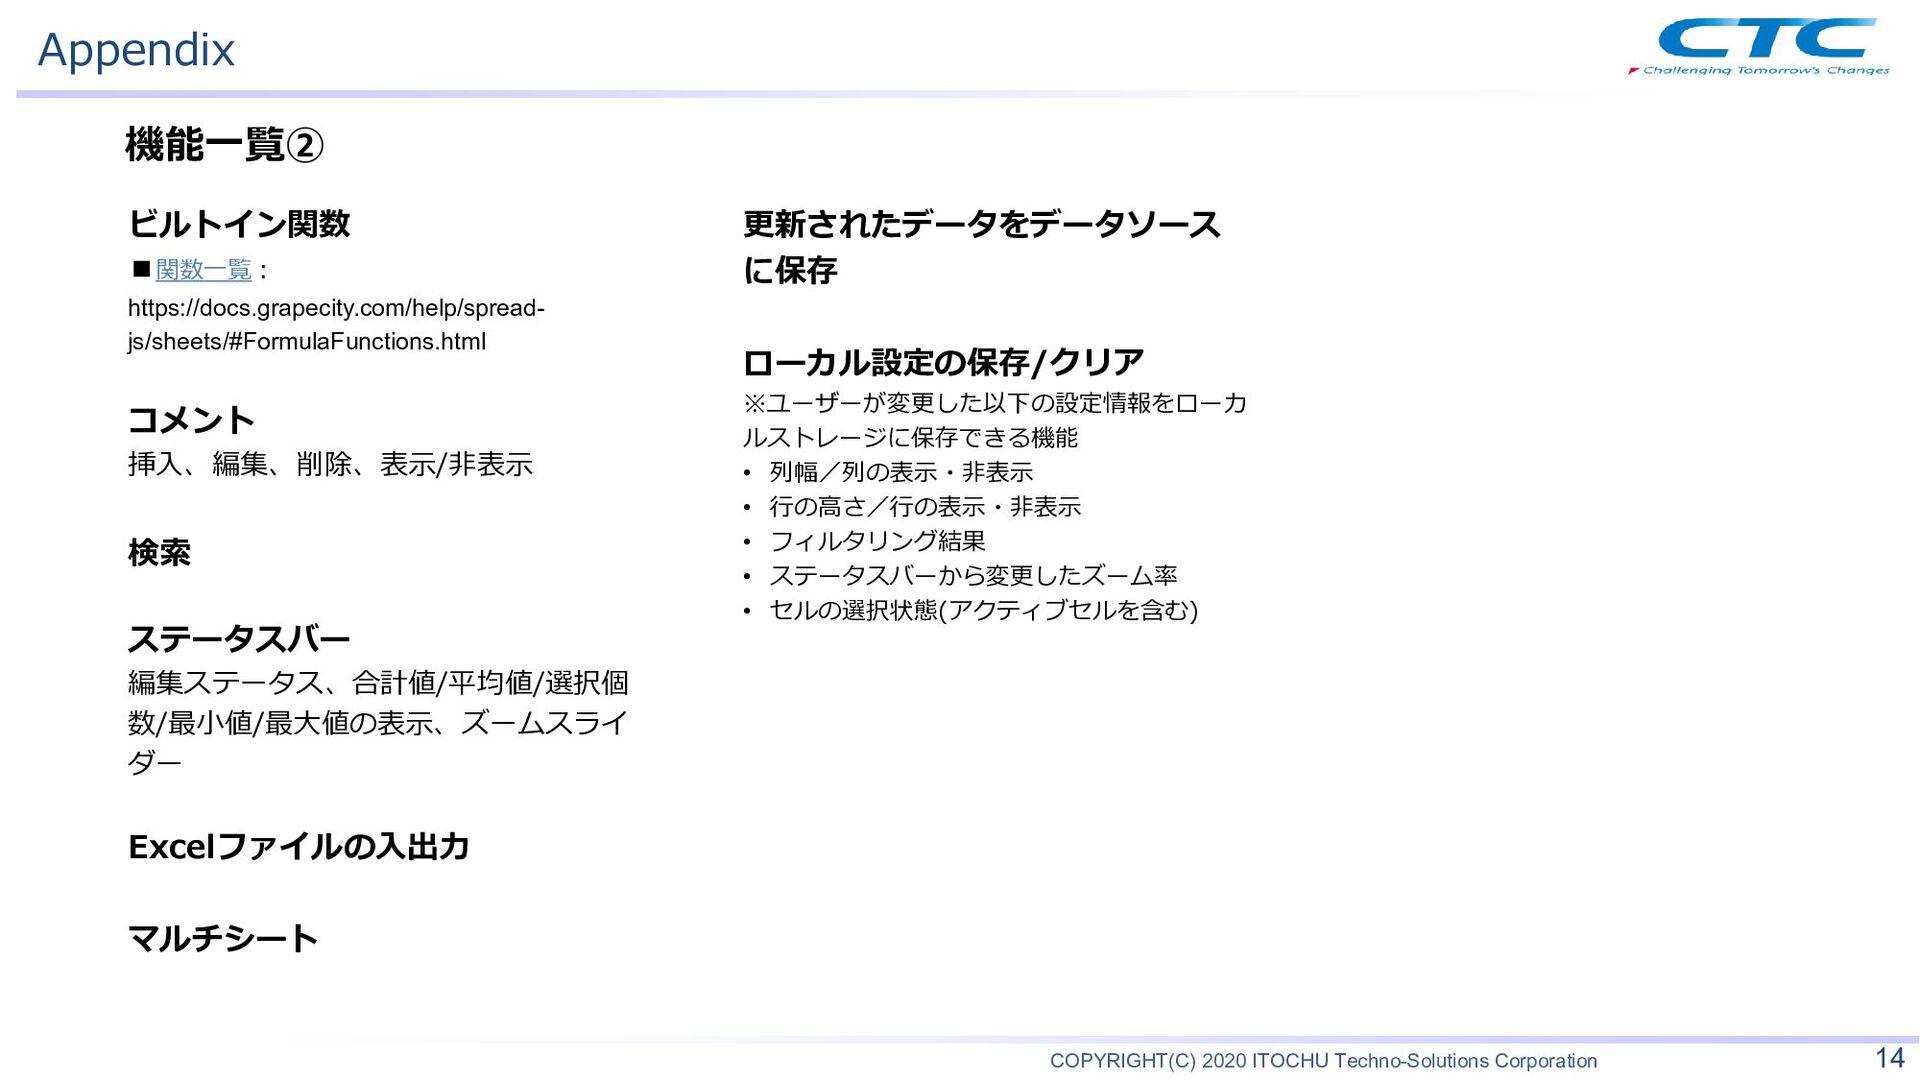 COPYRIGHT(C) 2020 ITOCHU Techno-Solutions Corpo...